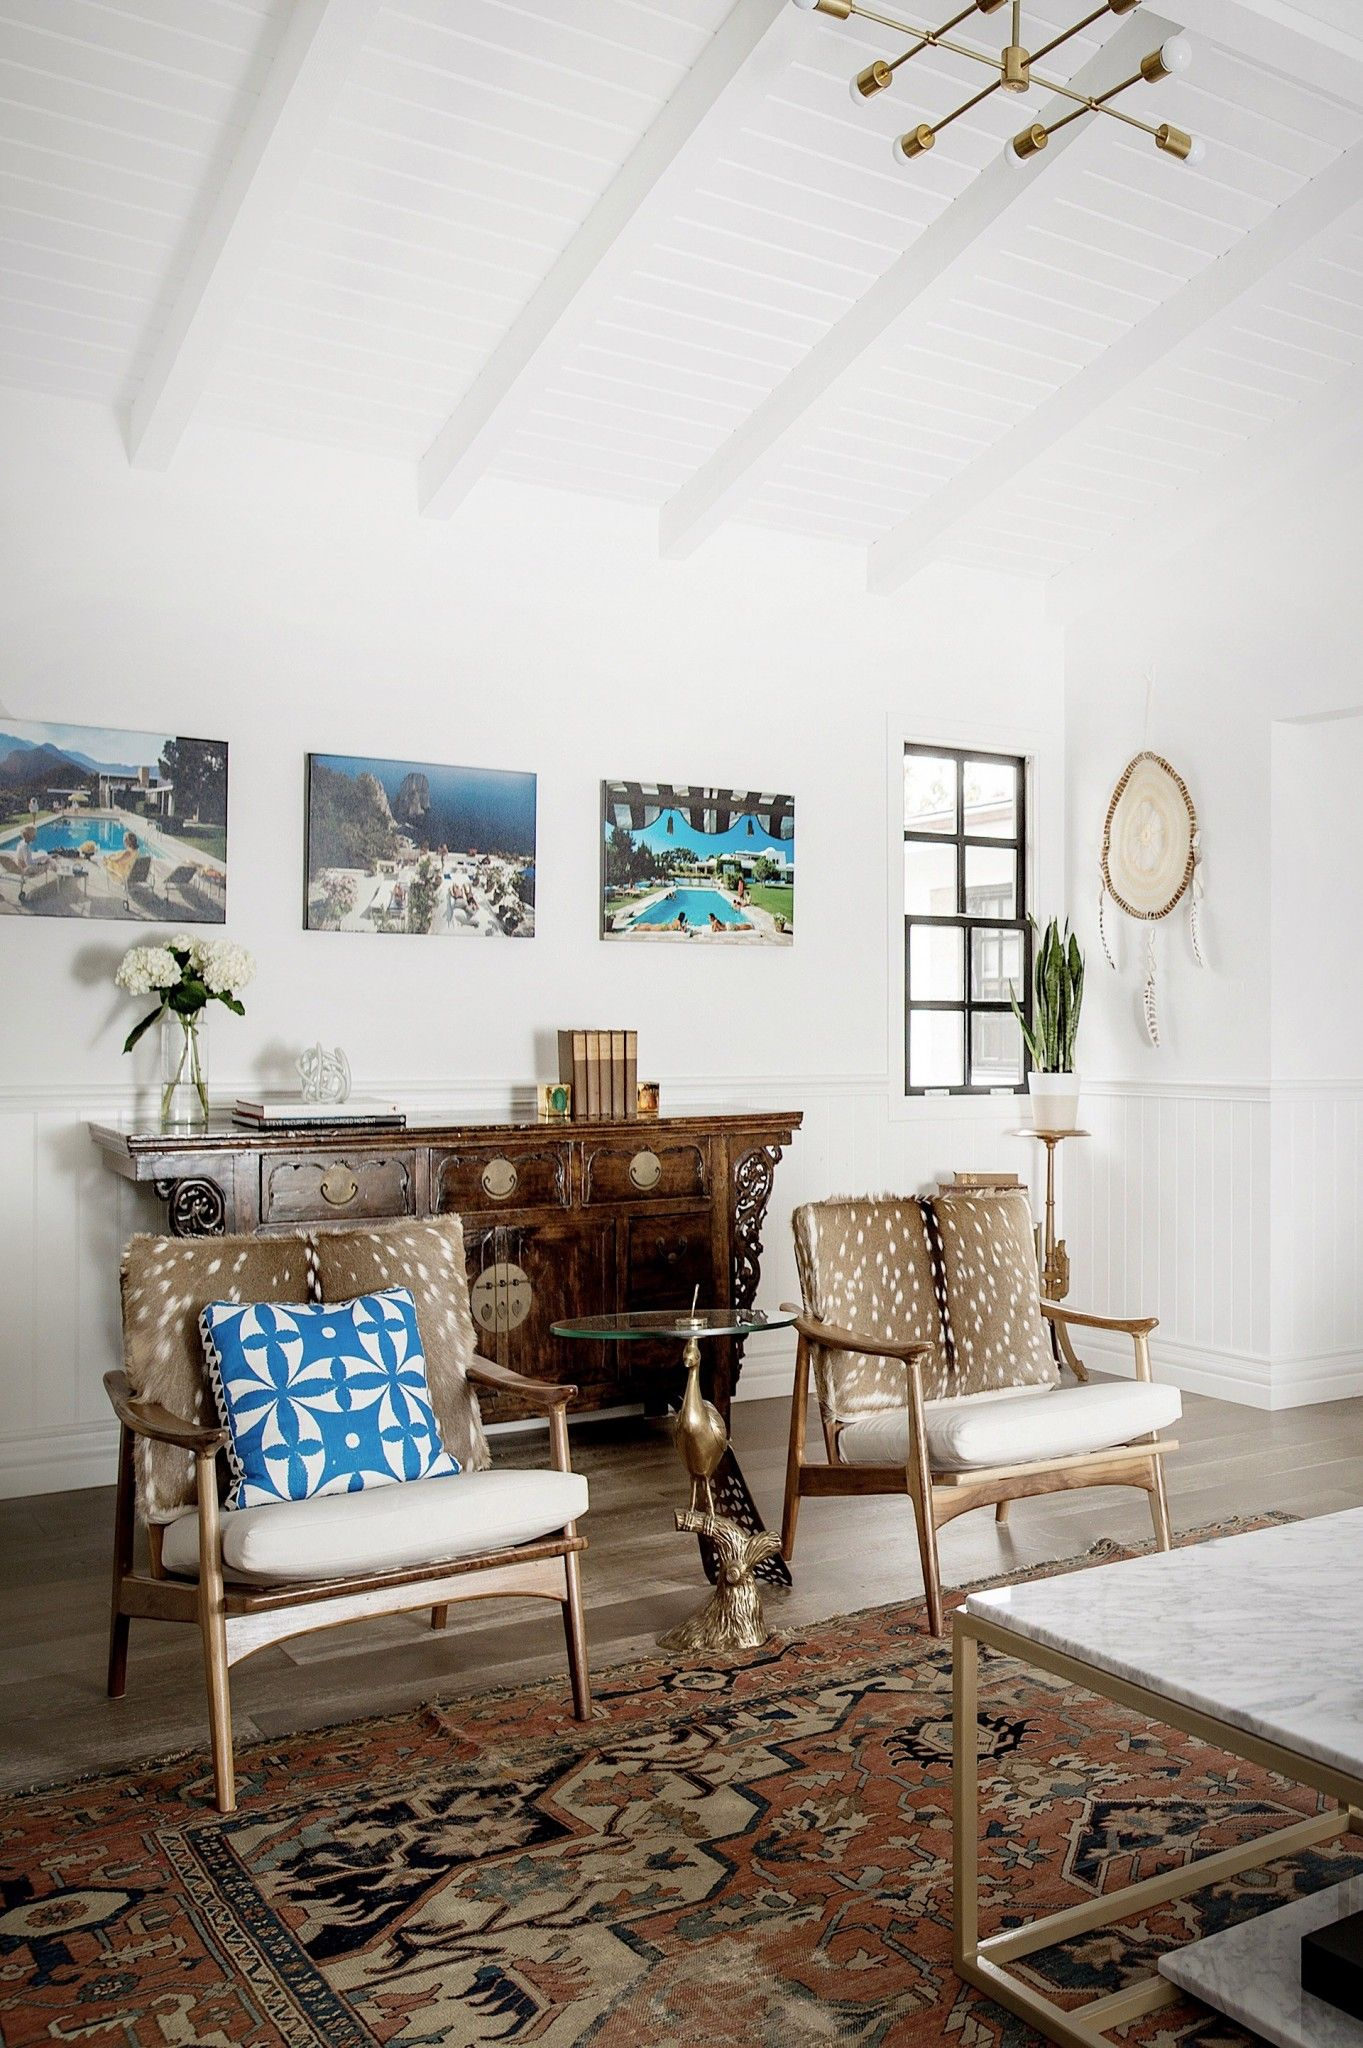 Modern bohemian home decor  A Beachside Modern Bohemian Home  BohoHome  Pinterest  Modern